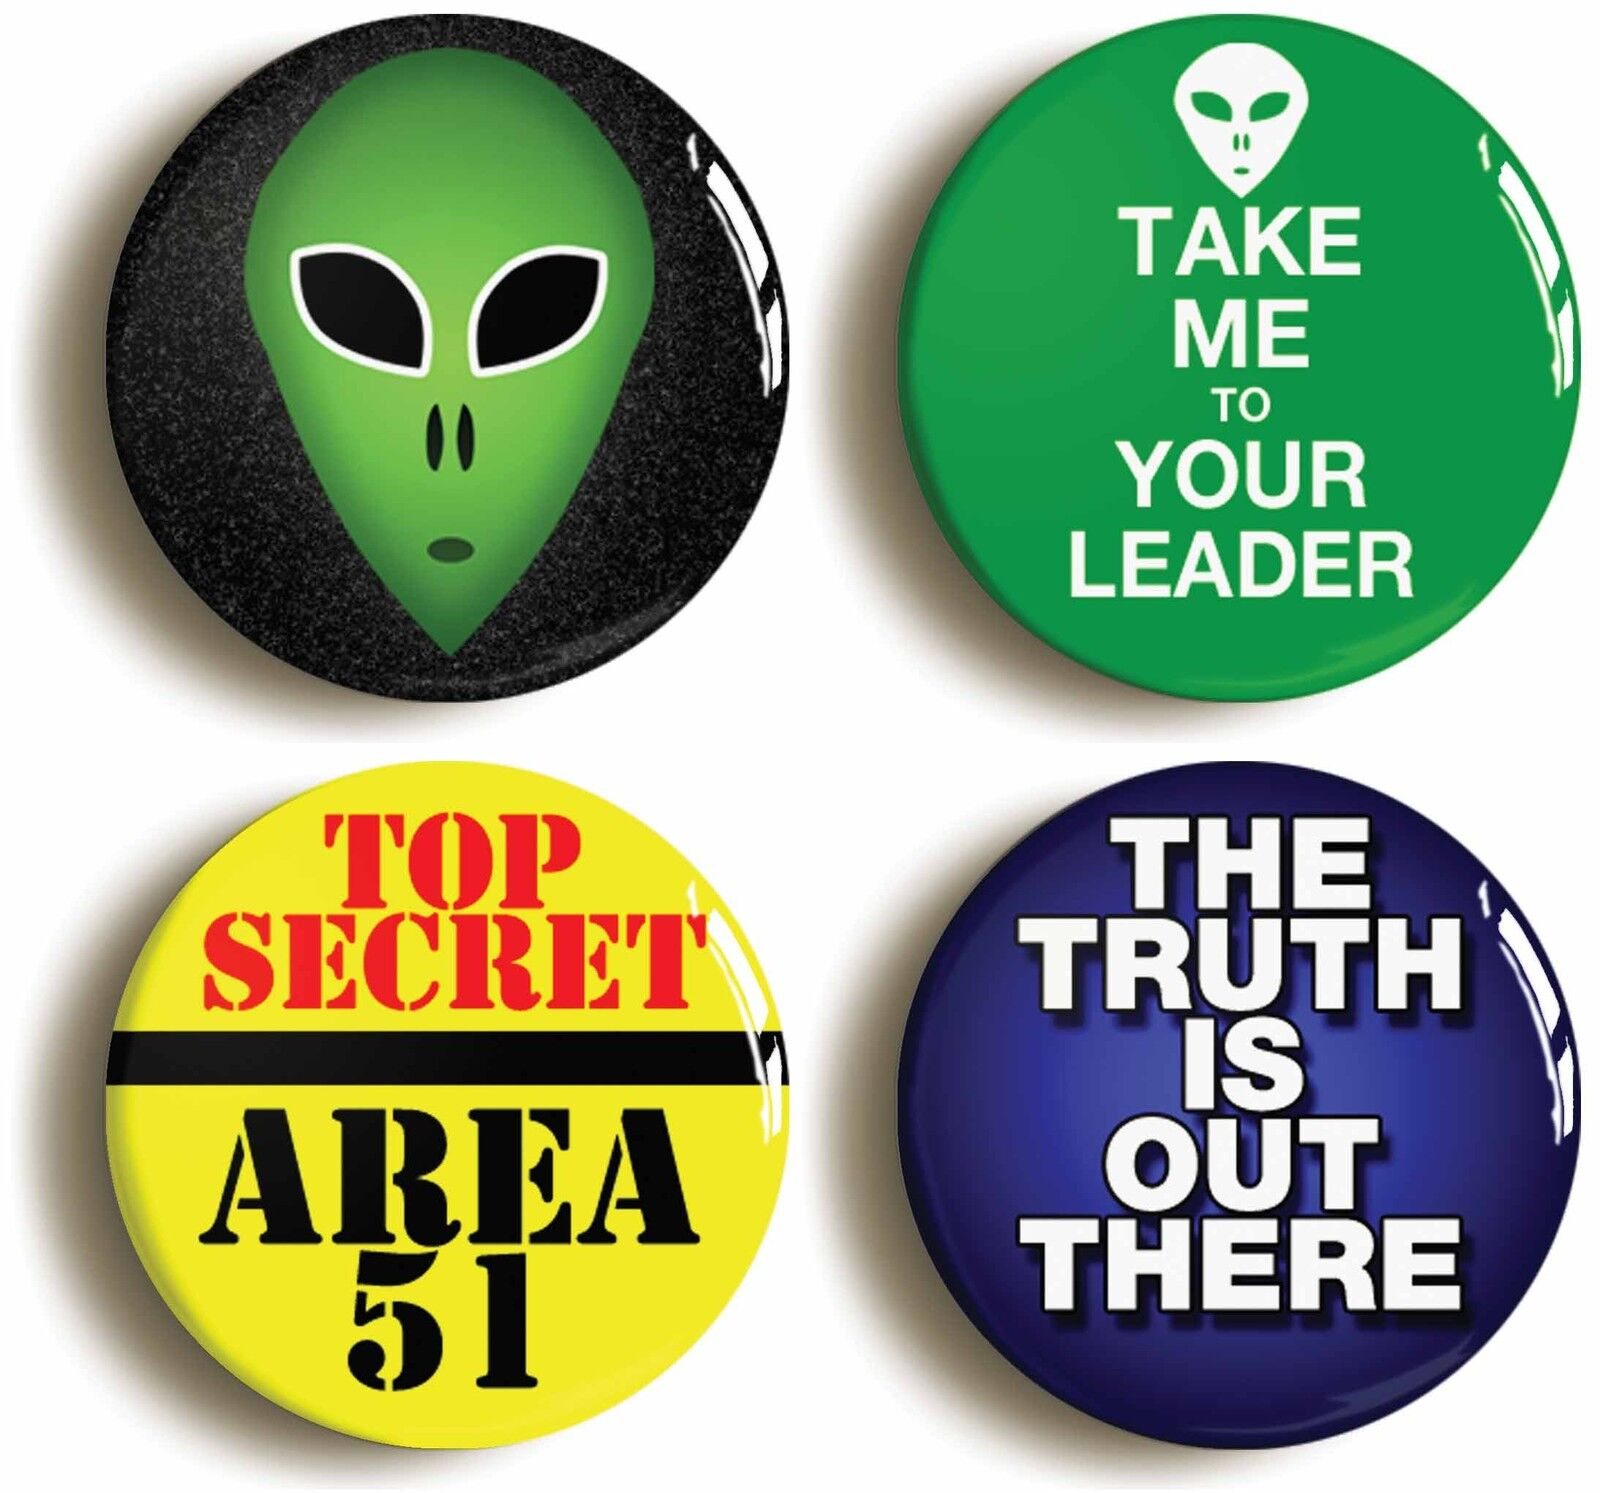 4 x alien badge button pins extra terrestrial ufo (size is 1inch/25mm diameter)